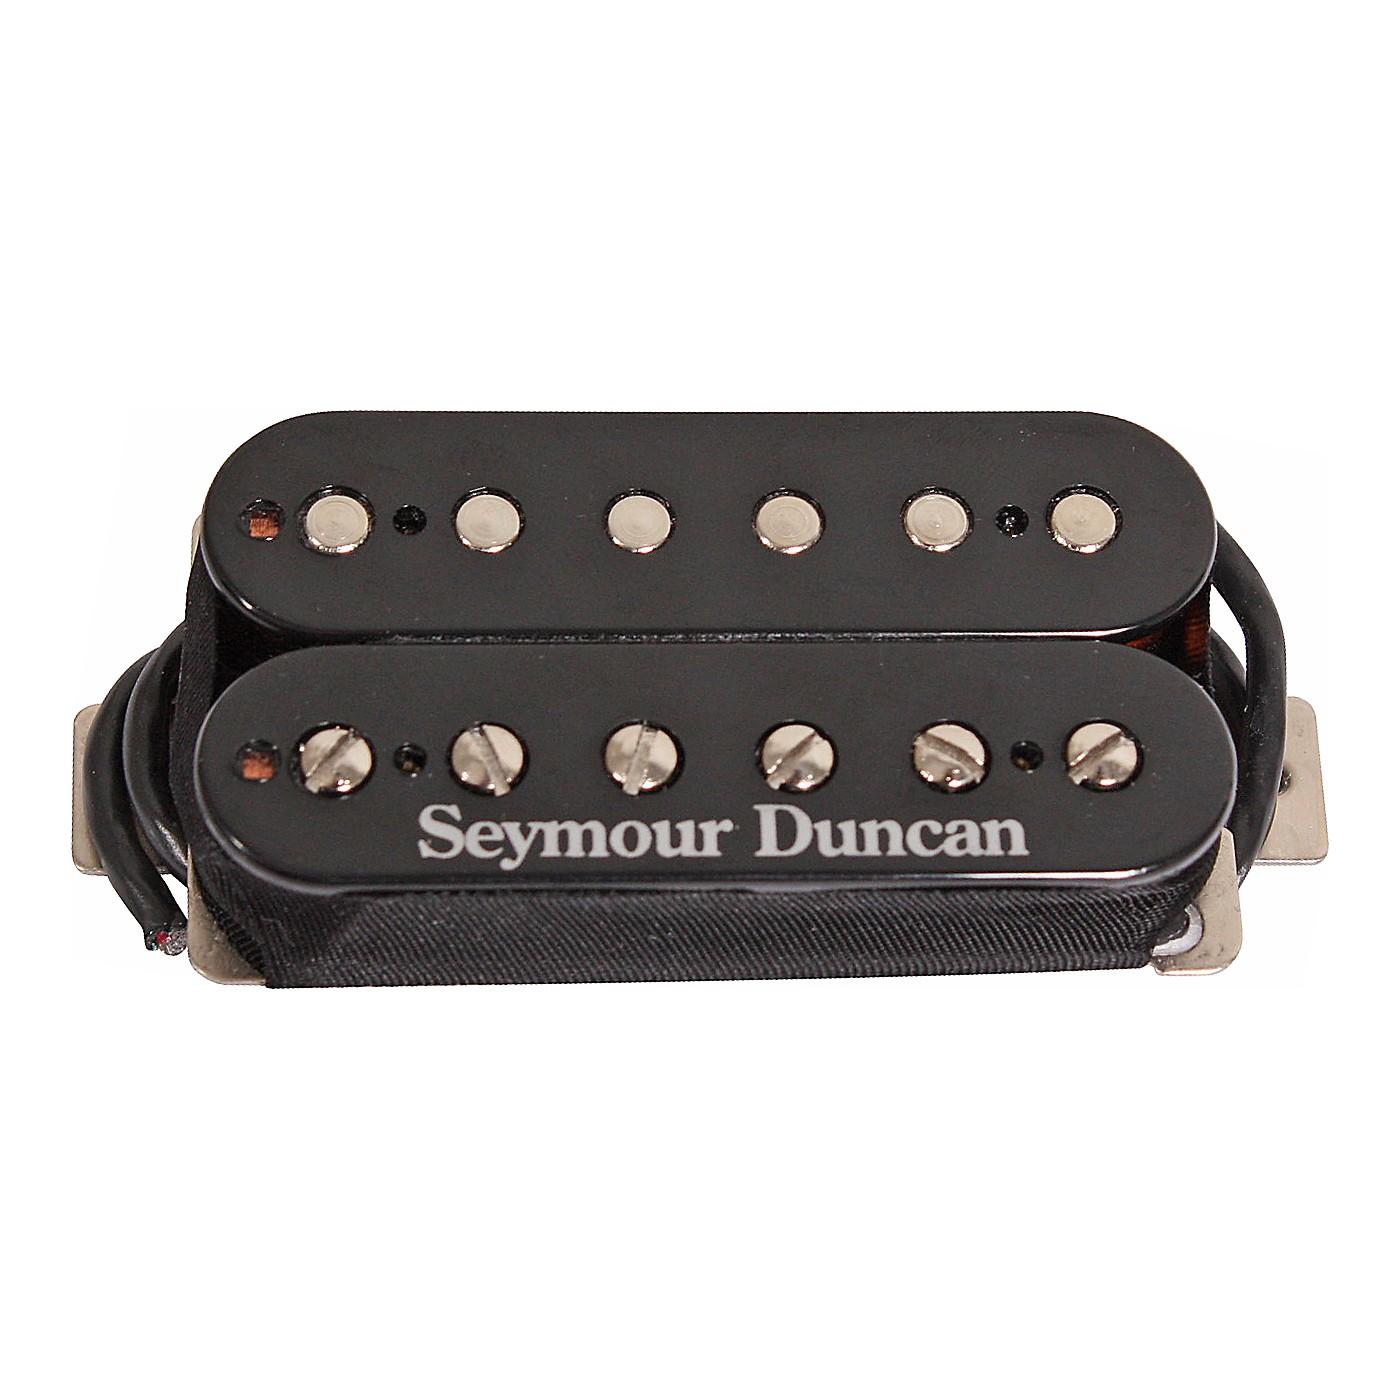 Seymour Duncan SH-11 Custom Custom Pickup thumbnail